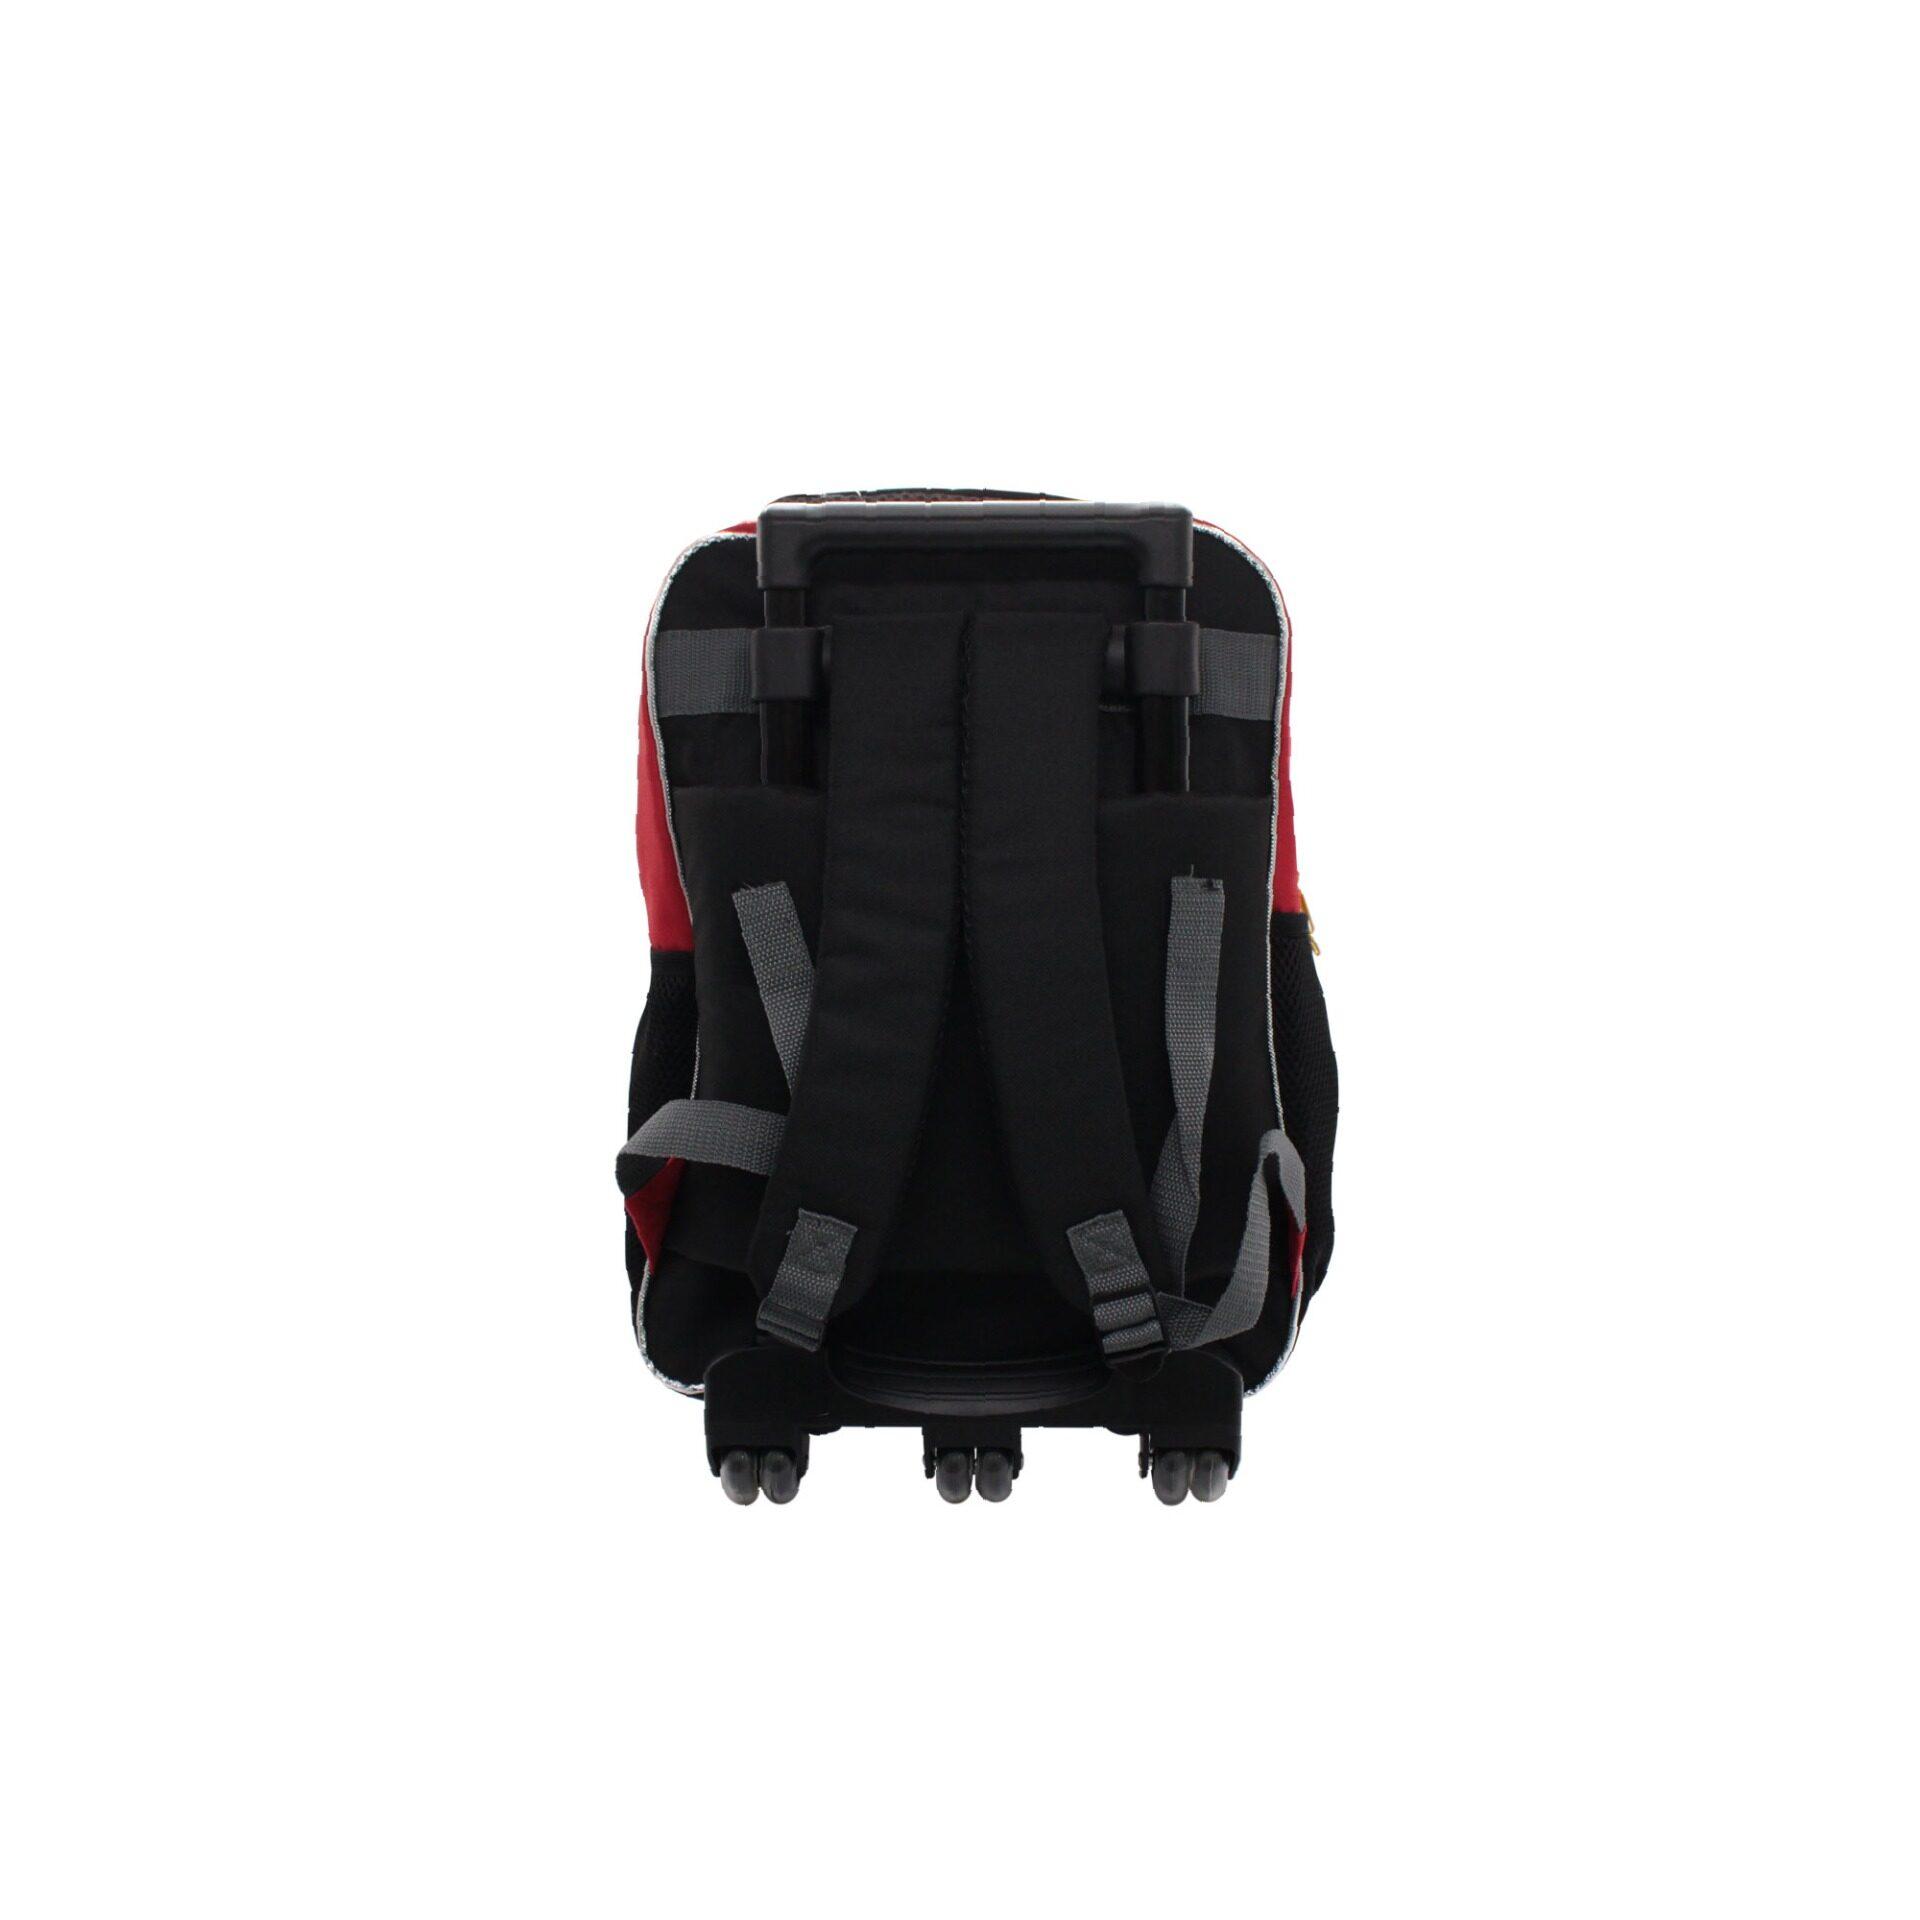 Boboiboy Fusion Kuasa 3 Kids Boys Pre School Trolley Bag With 2 Wheels & Handle (Black & Yellow)